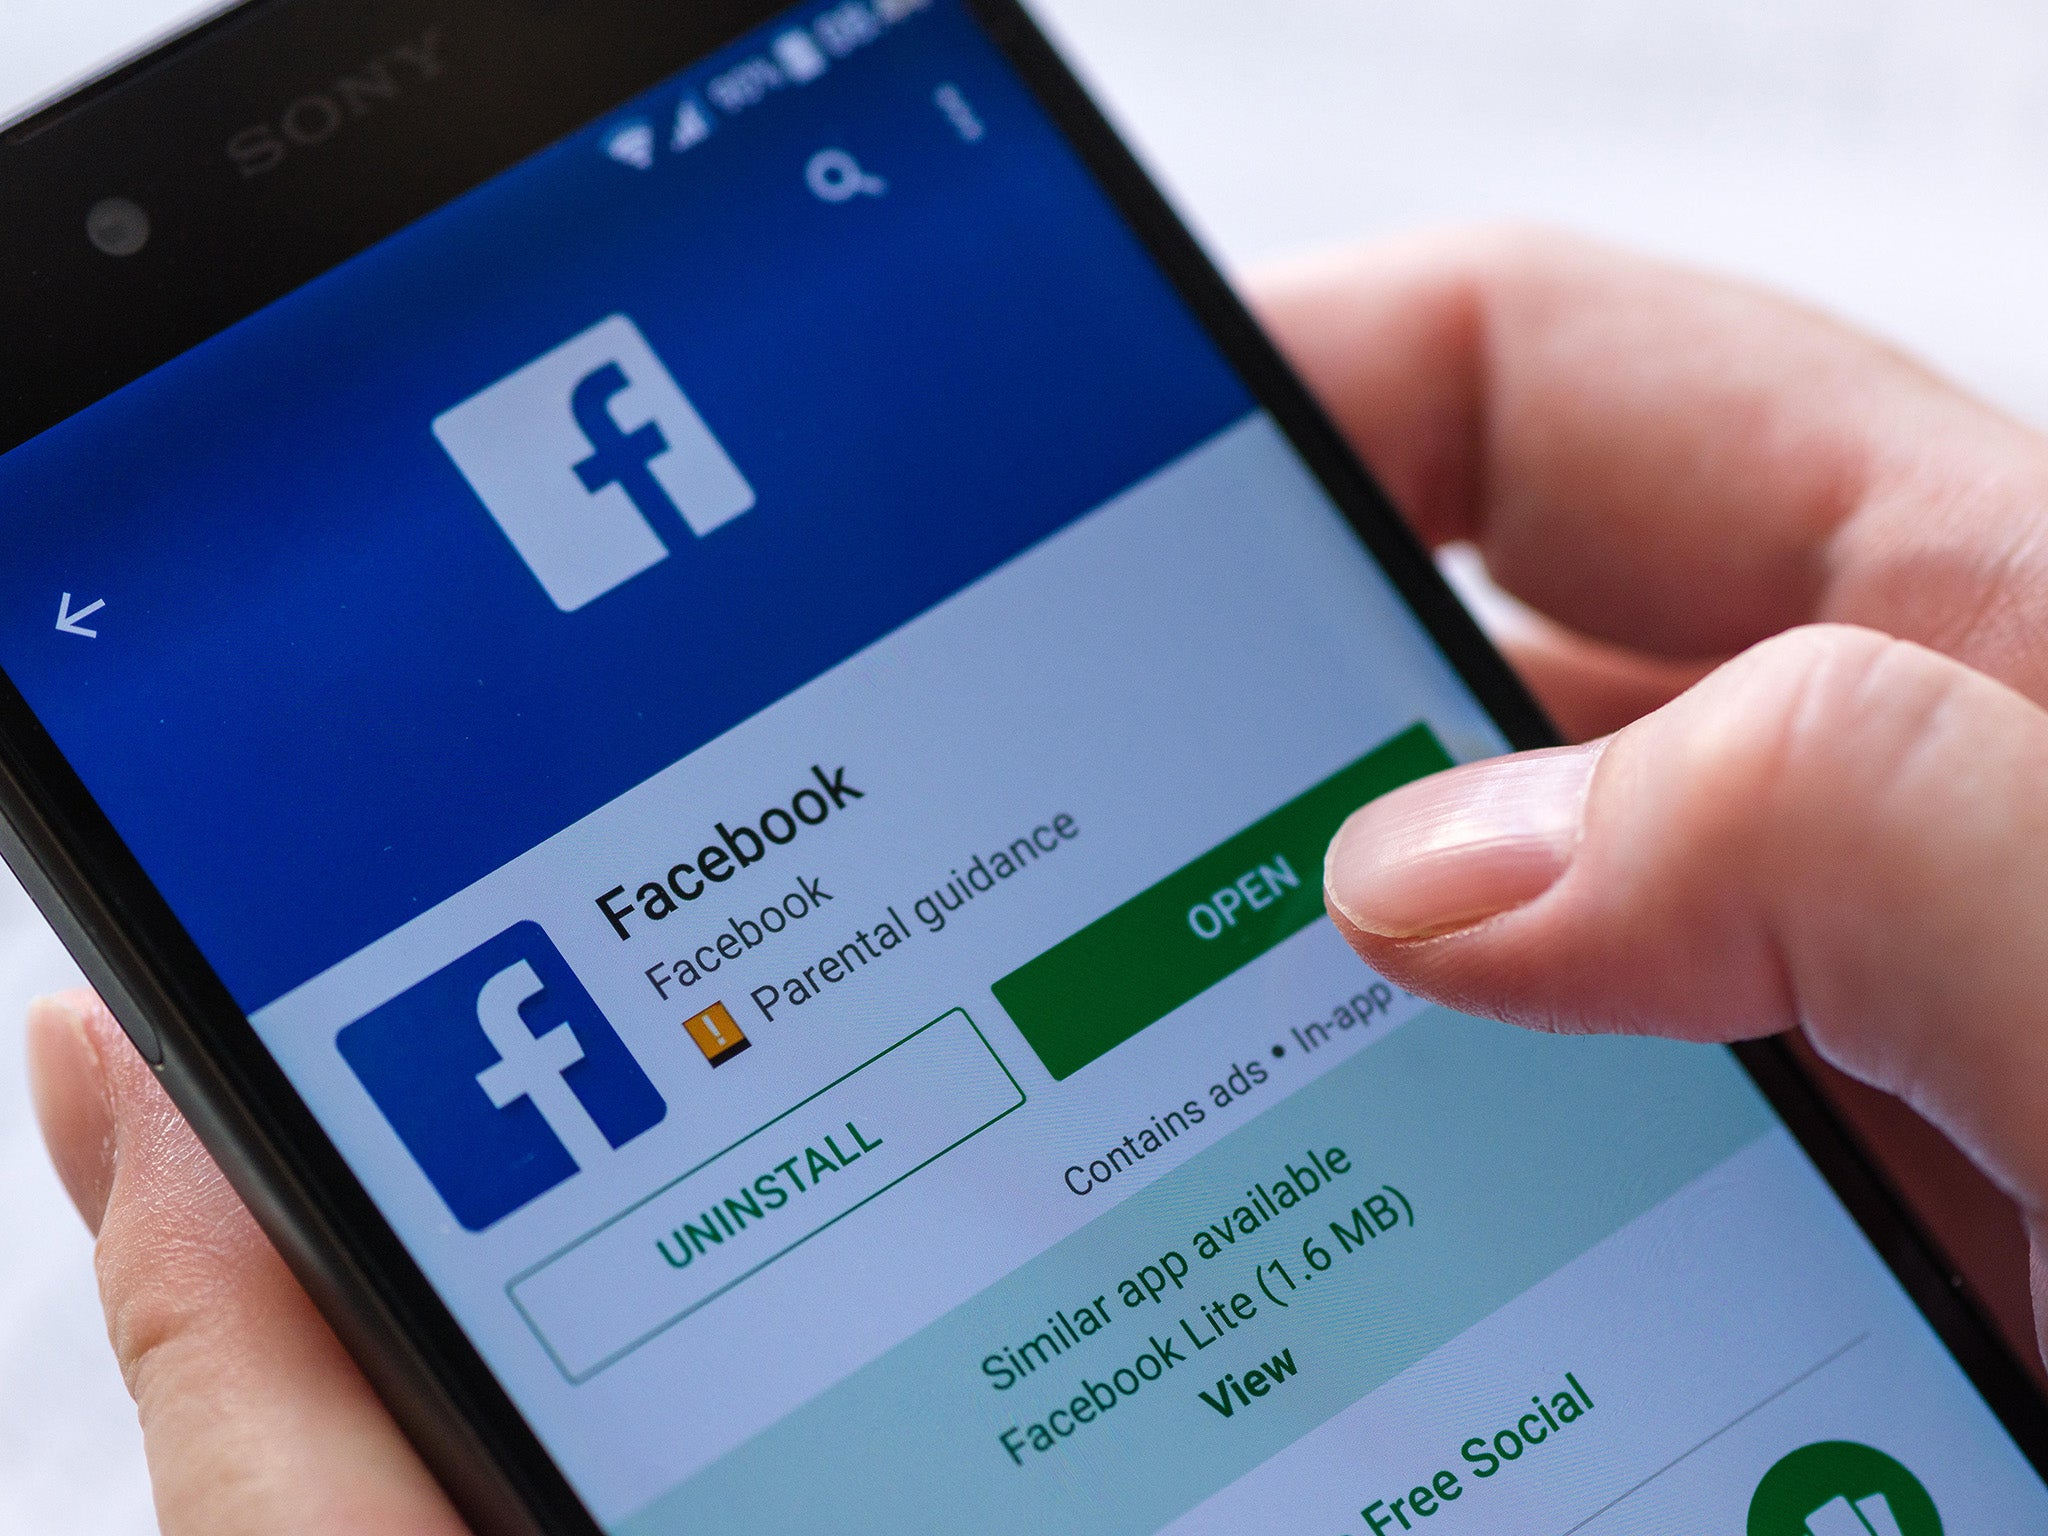 Free hookup sites no fees facebook contempt images